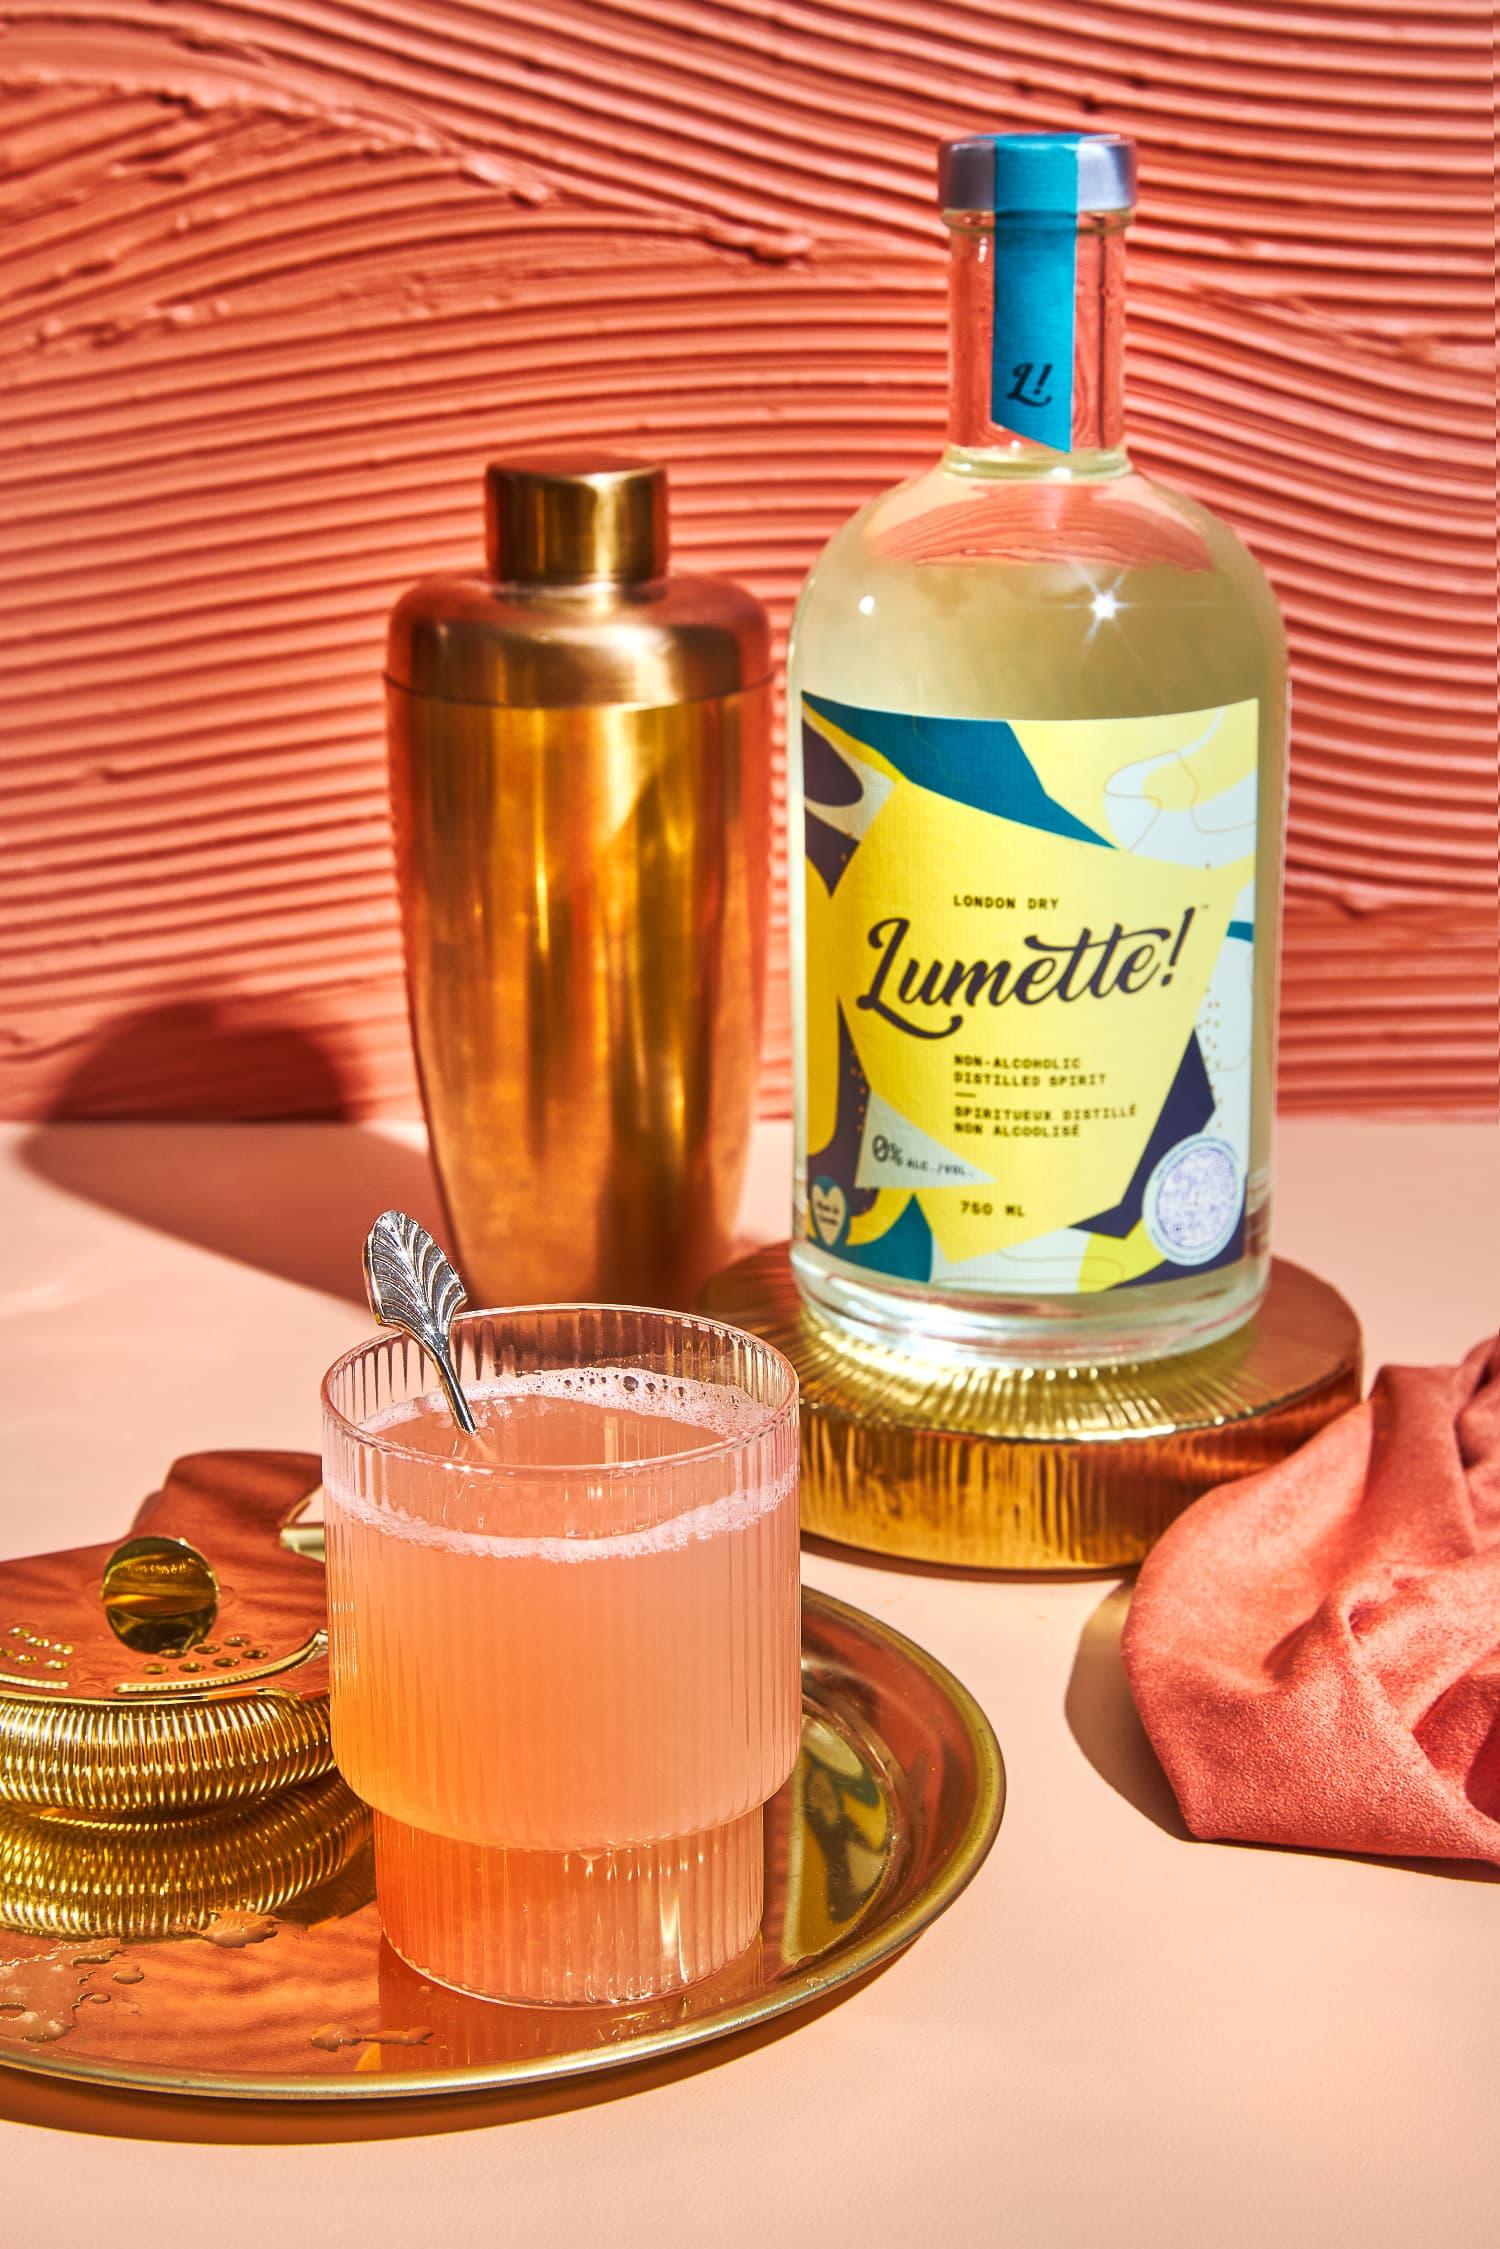 Lumette London Dry